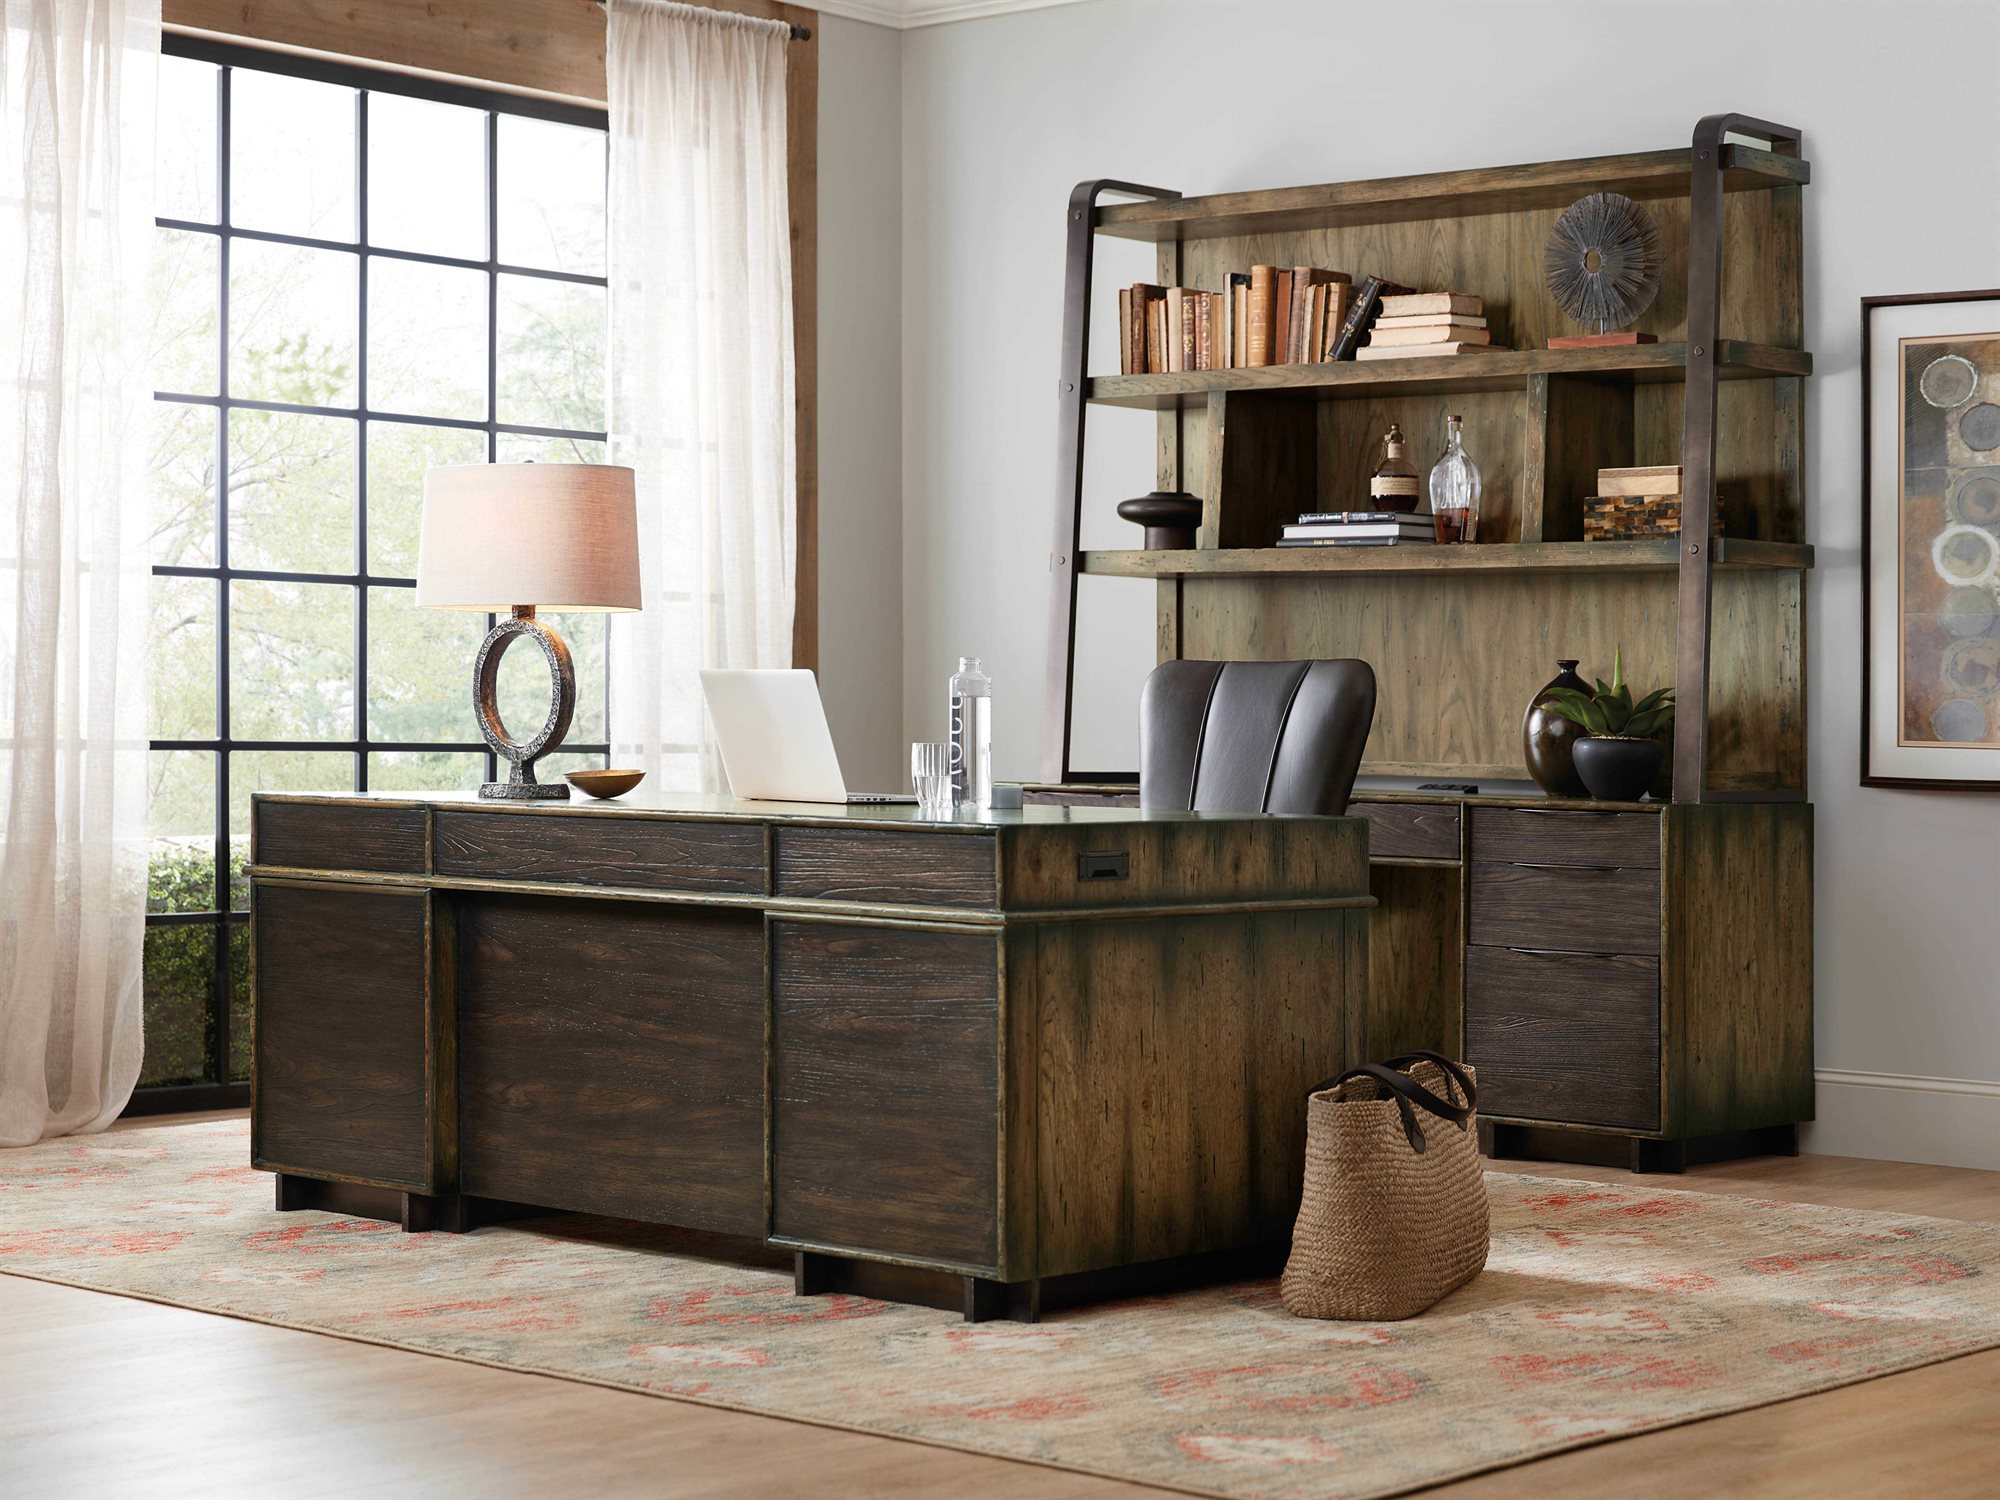 Hooker Furniture American Life Crafted Home Office Set Hoo165410563dkw1set